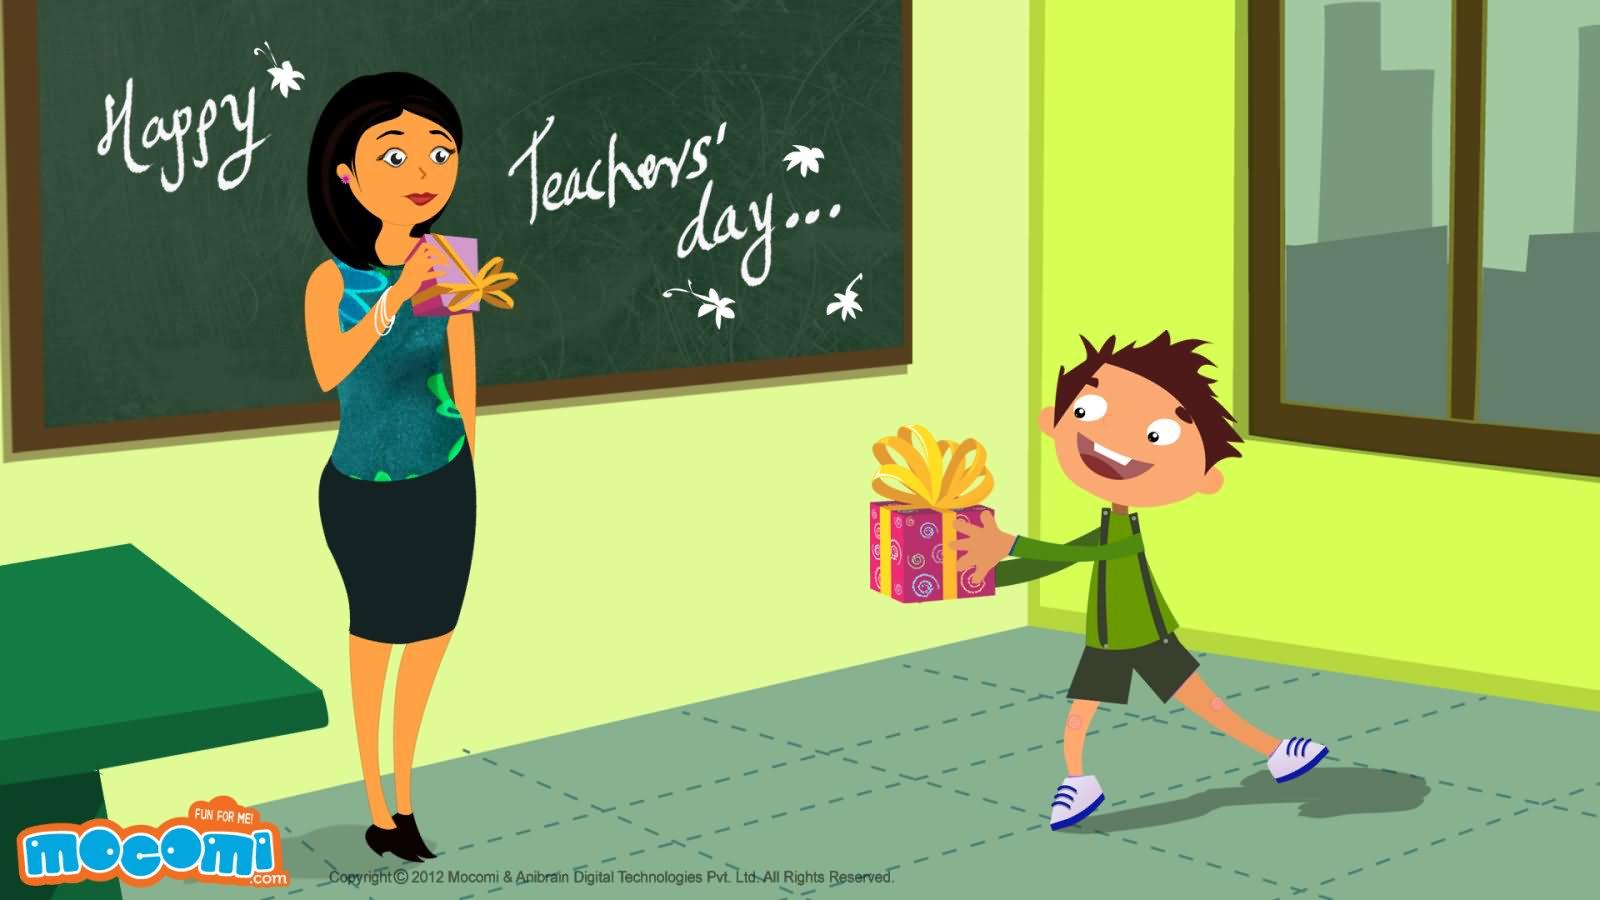 clipart for teachers day - photo #31